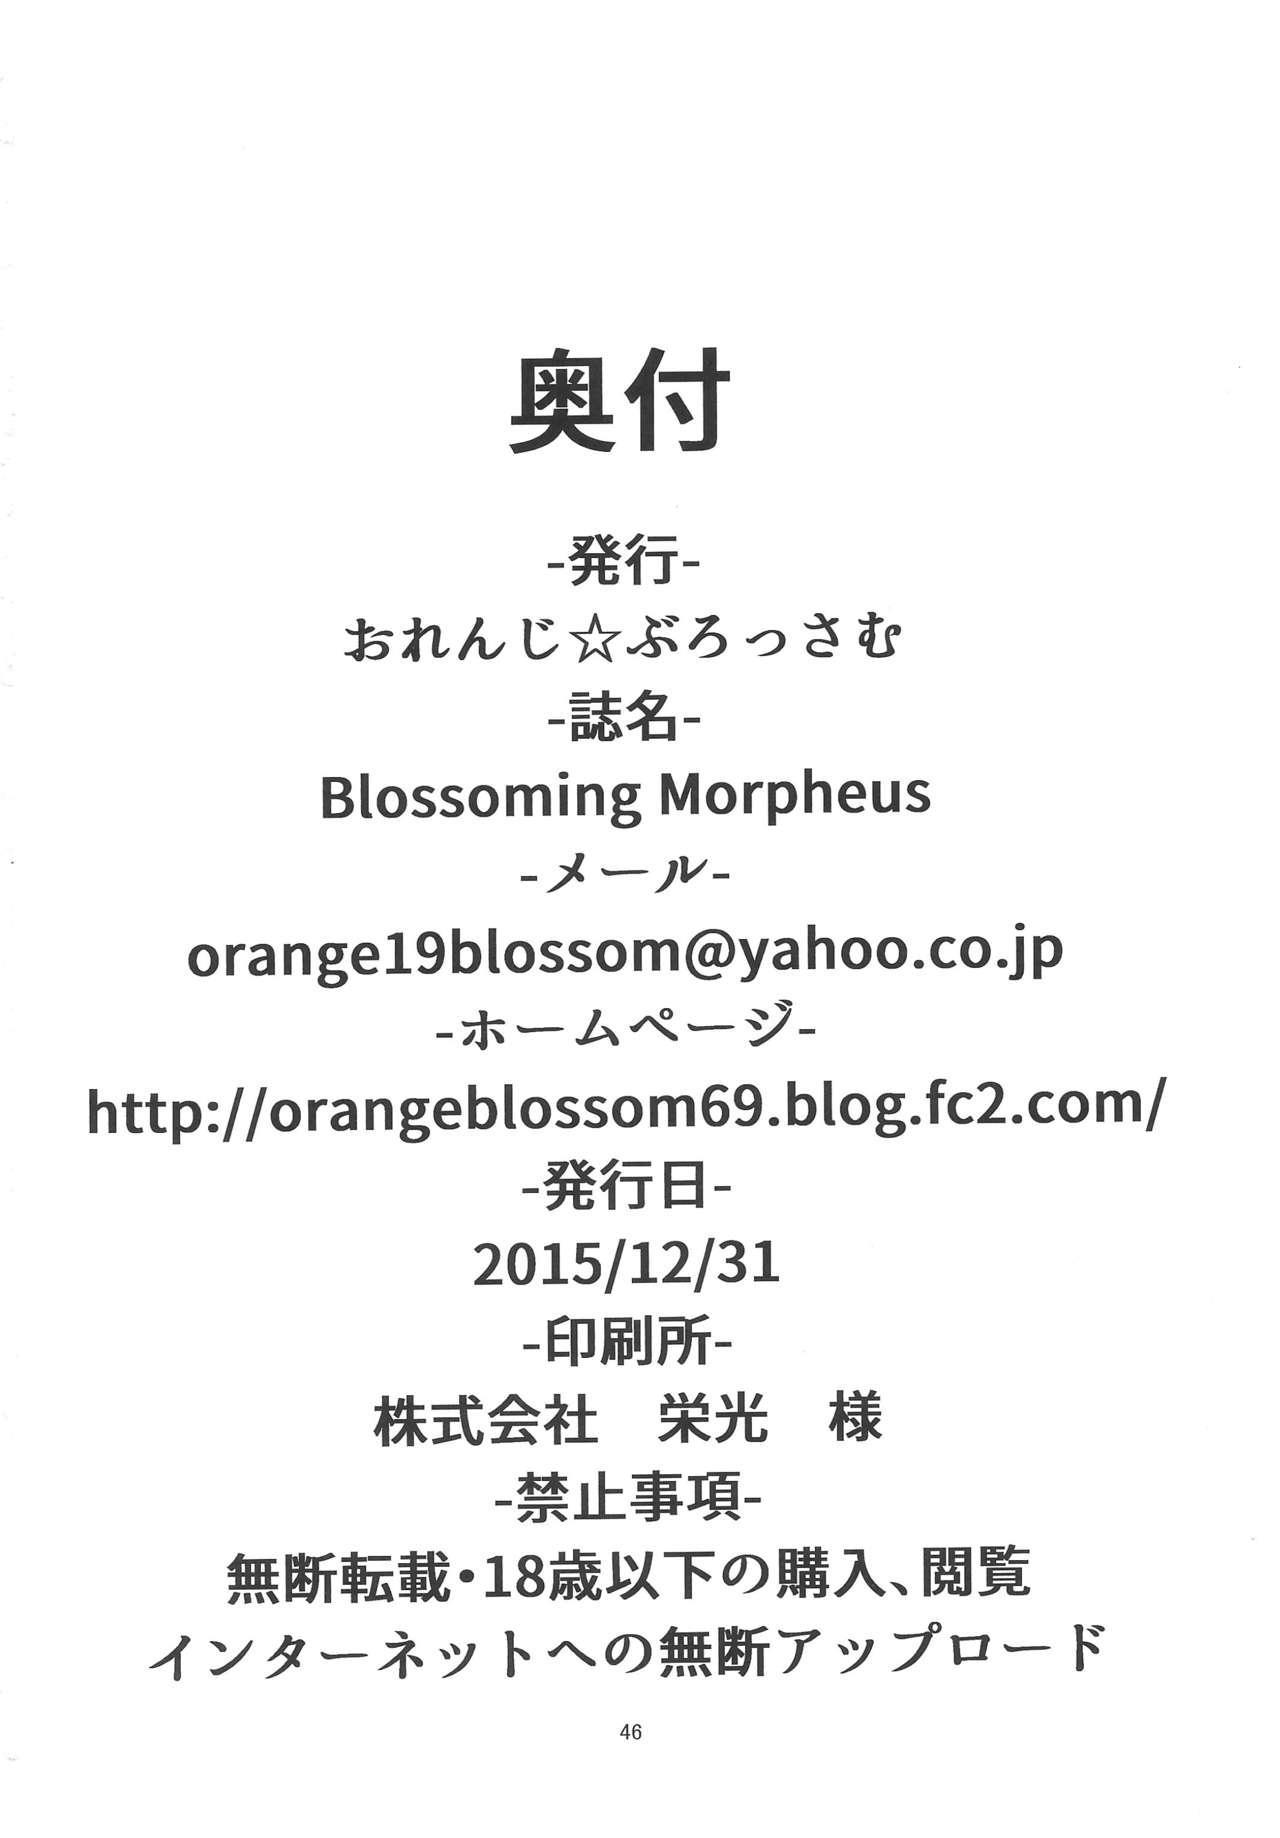 Blossoming Morpheus 46